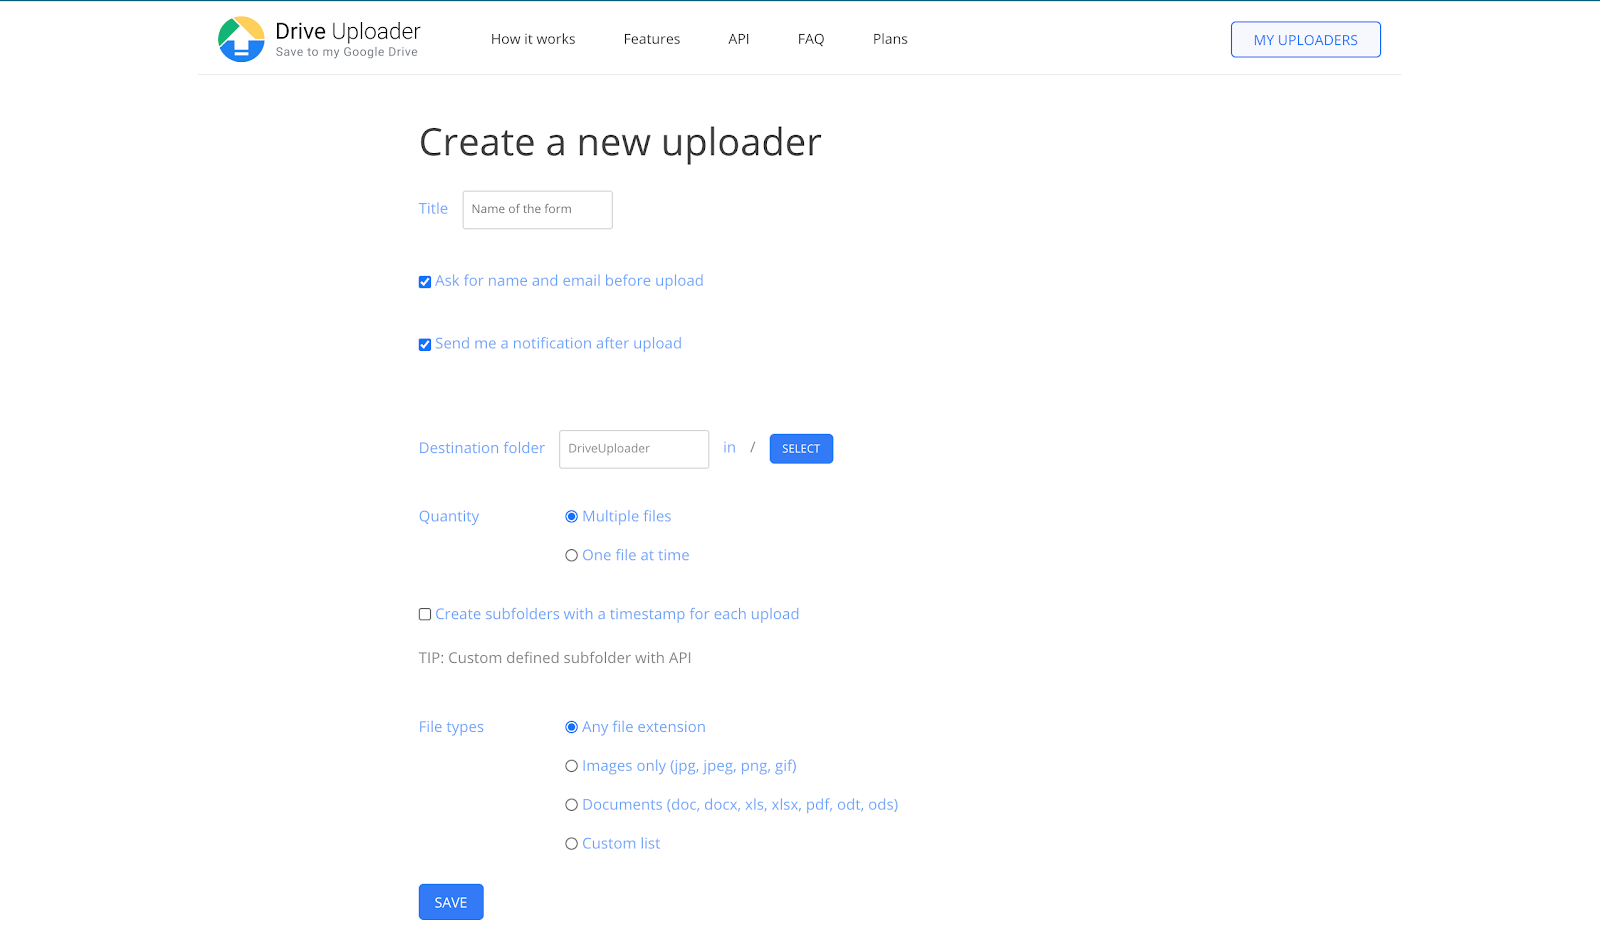 Create a new uploader